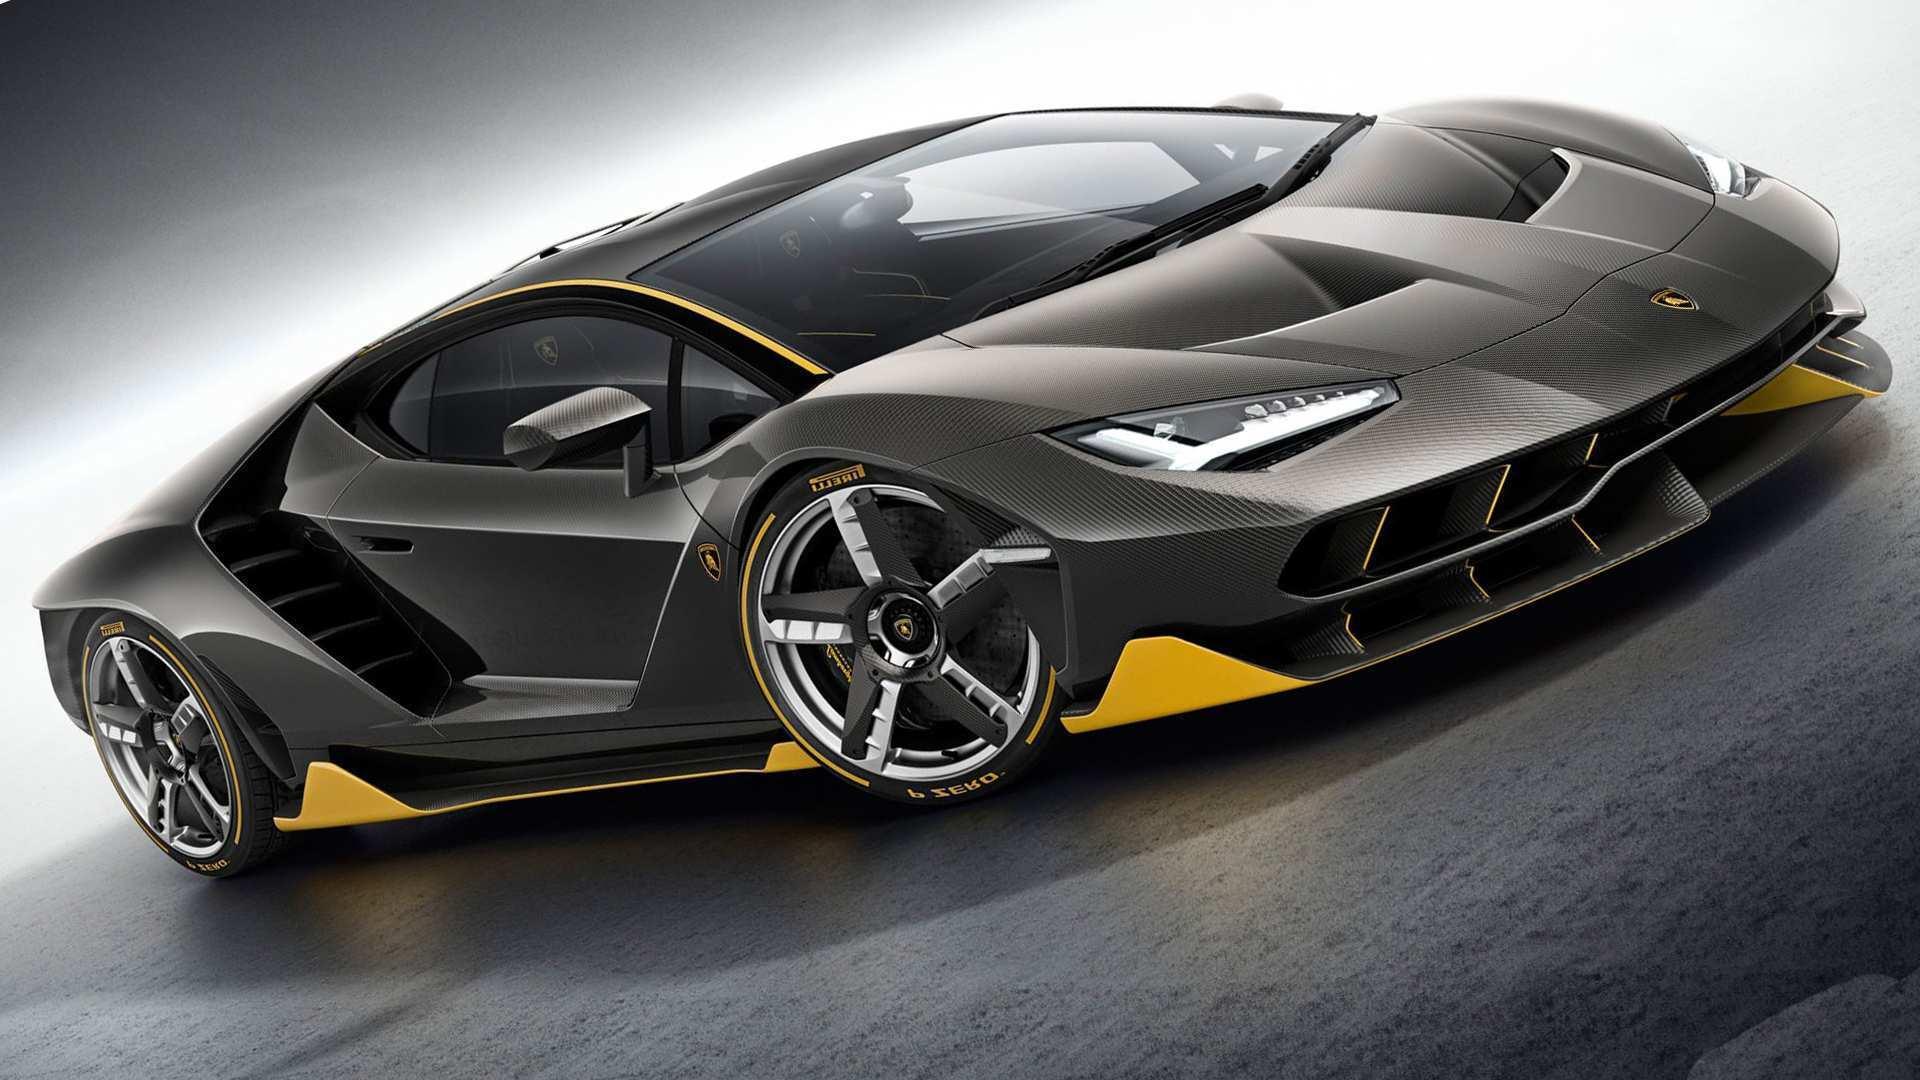 34 Concept of 2019 Lamborghini Centenario Photos with 2019 Lamborghini Centenario